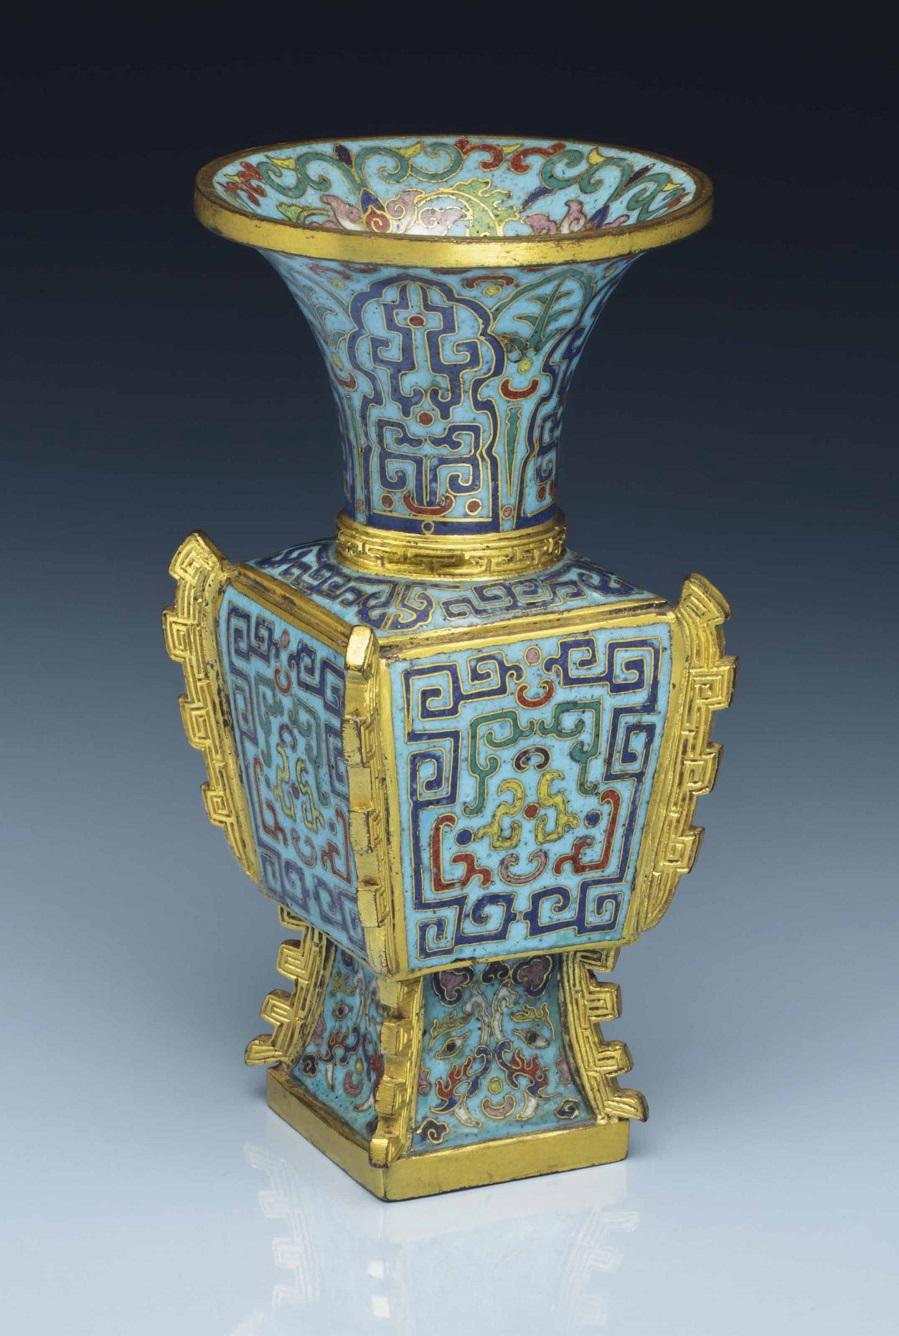 2014_NYR_02873_0612_000a_small_cloisonne_enamel_archaistic_faceted_vase_fanggu_qianlong_perio.jpg